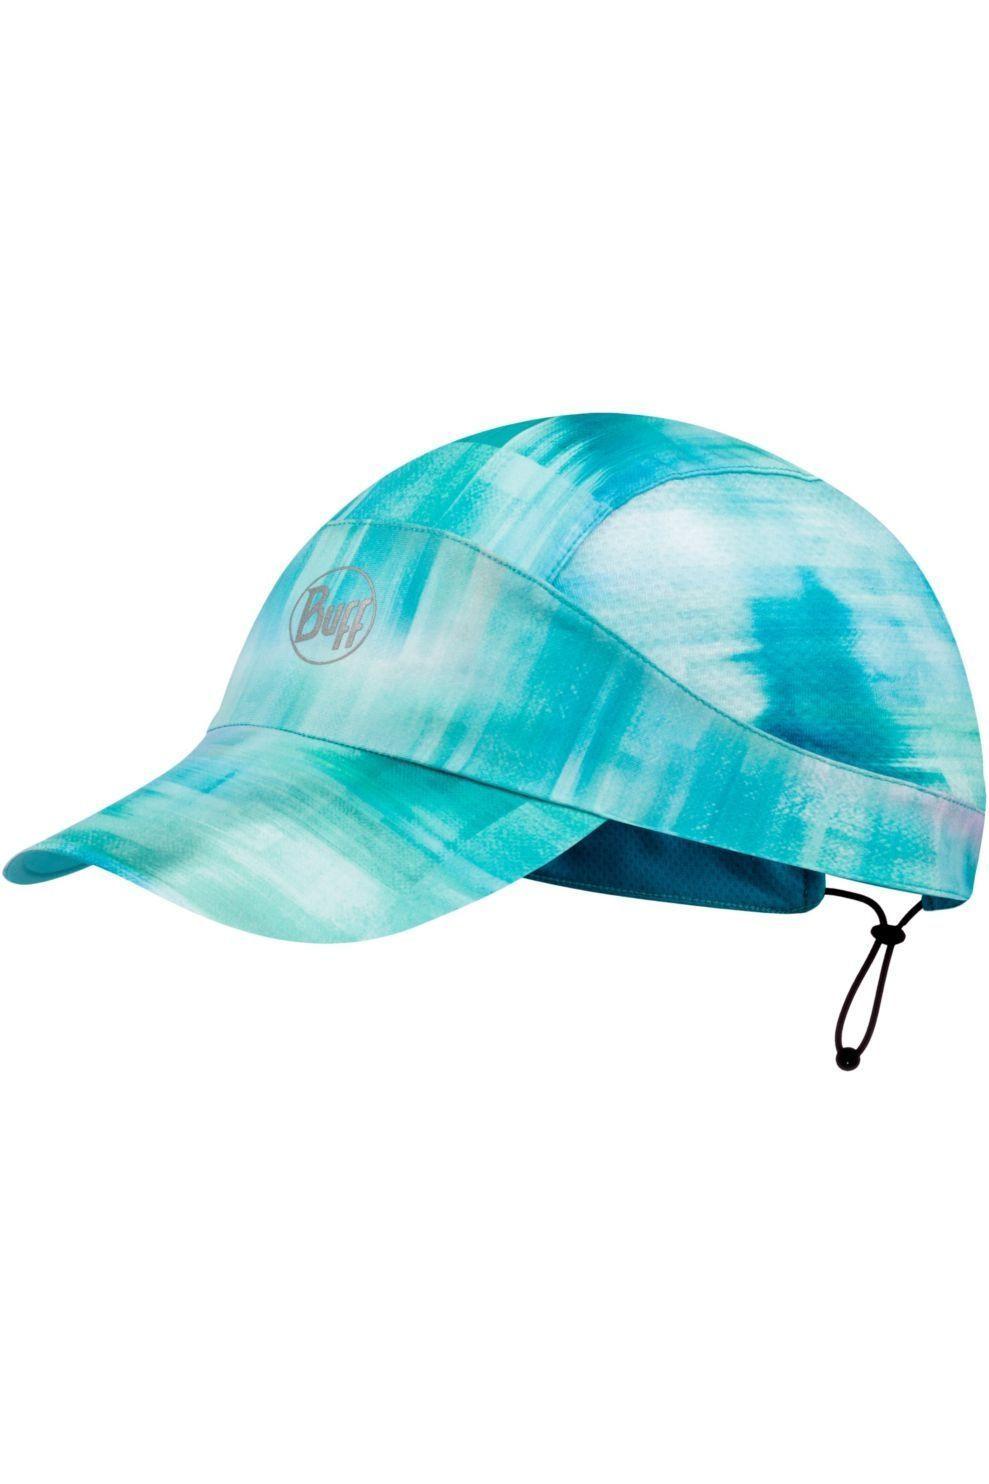 BUFF Pet Pack Run Patterned - Blauw/Patroon - Maat: S-M